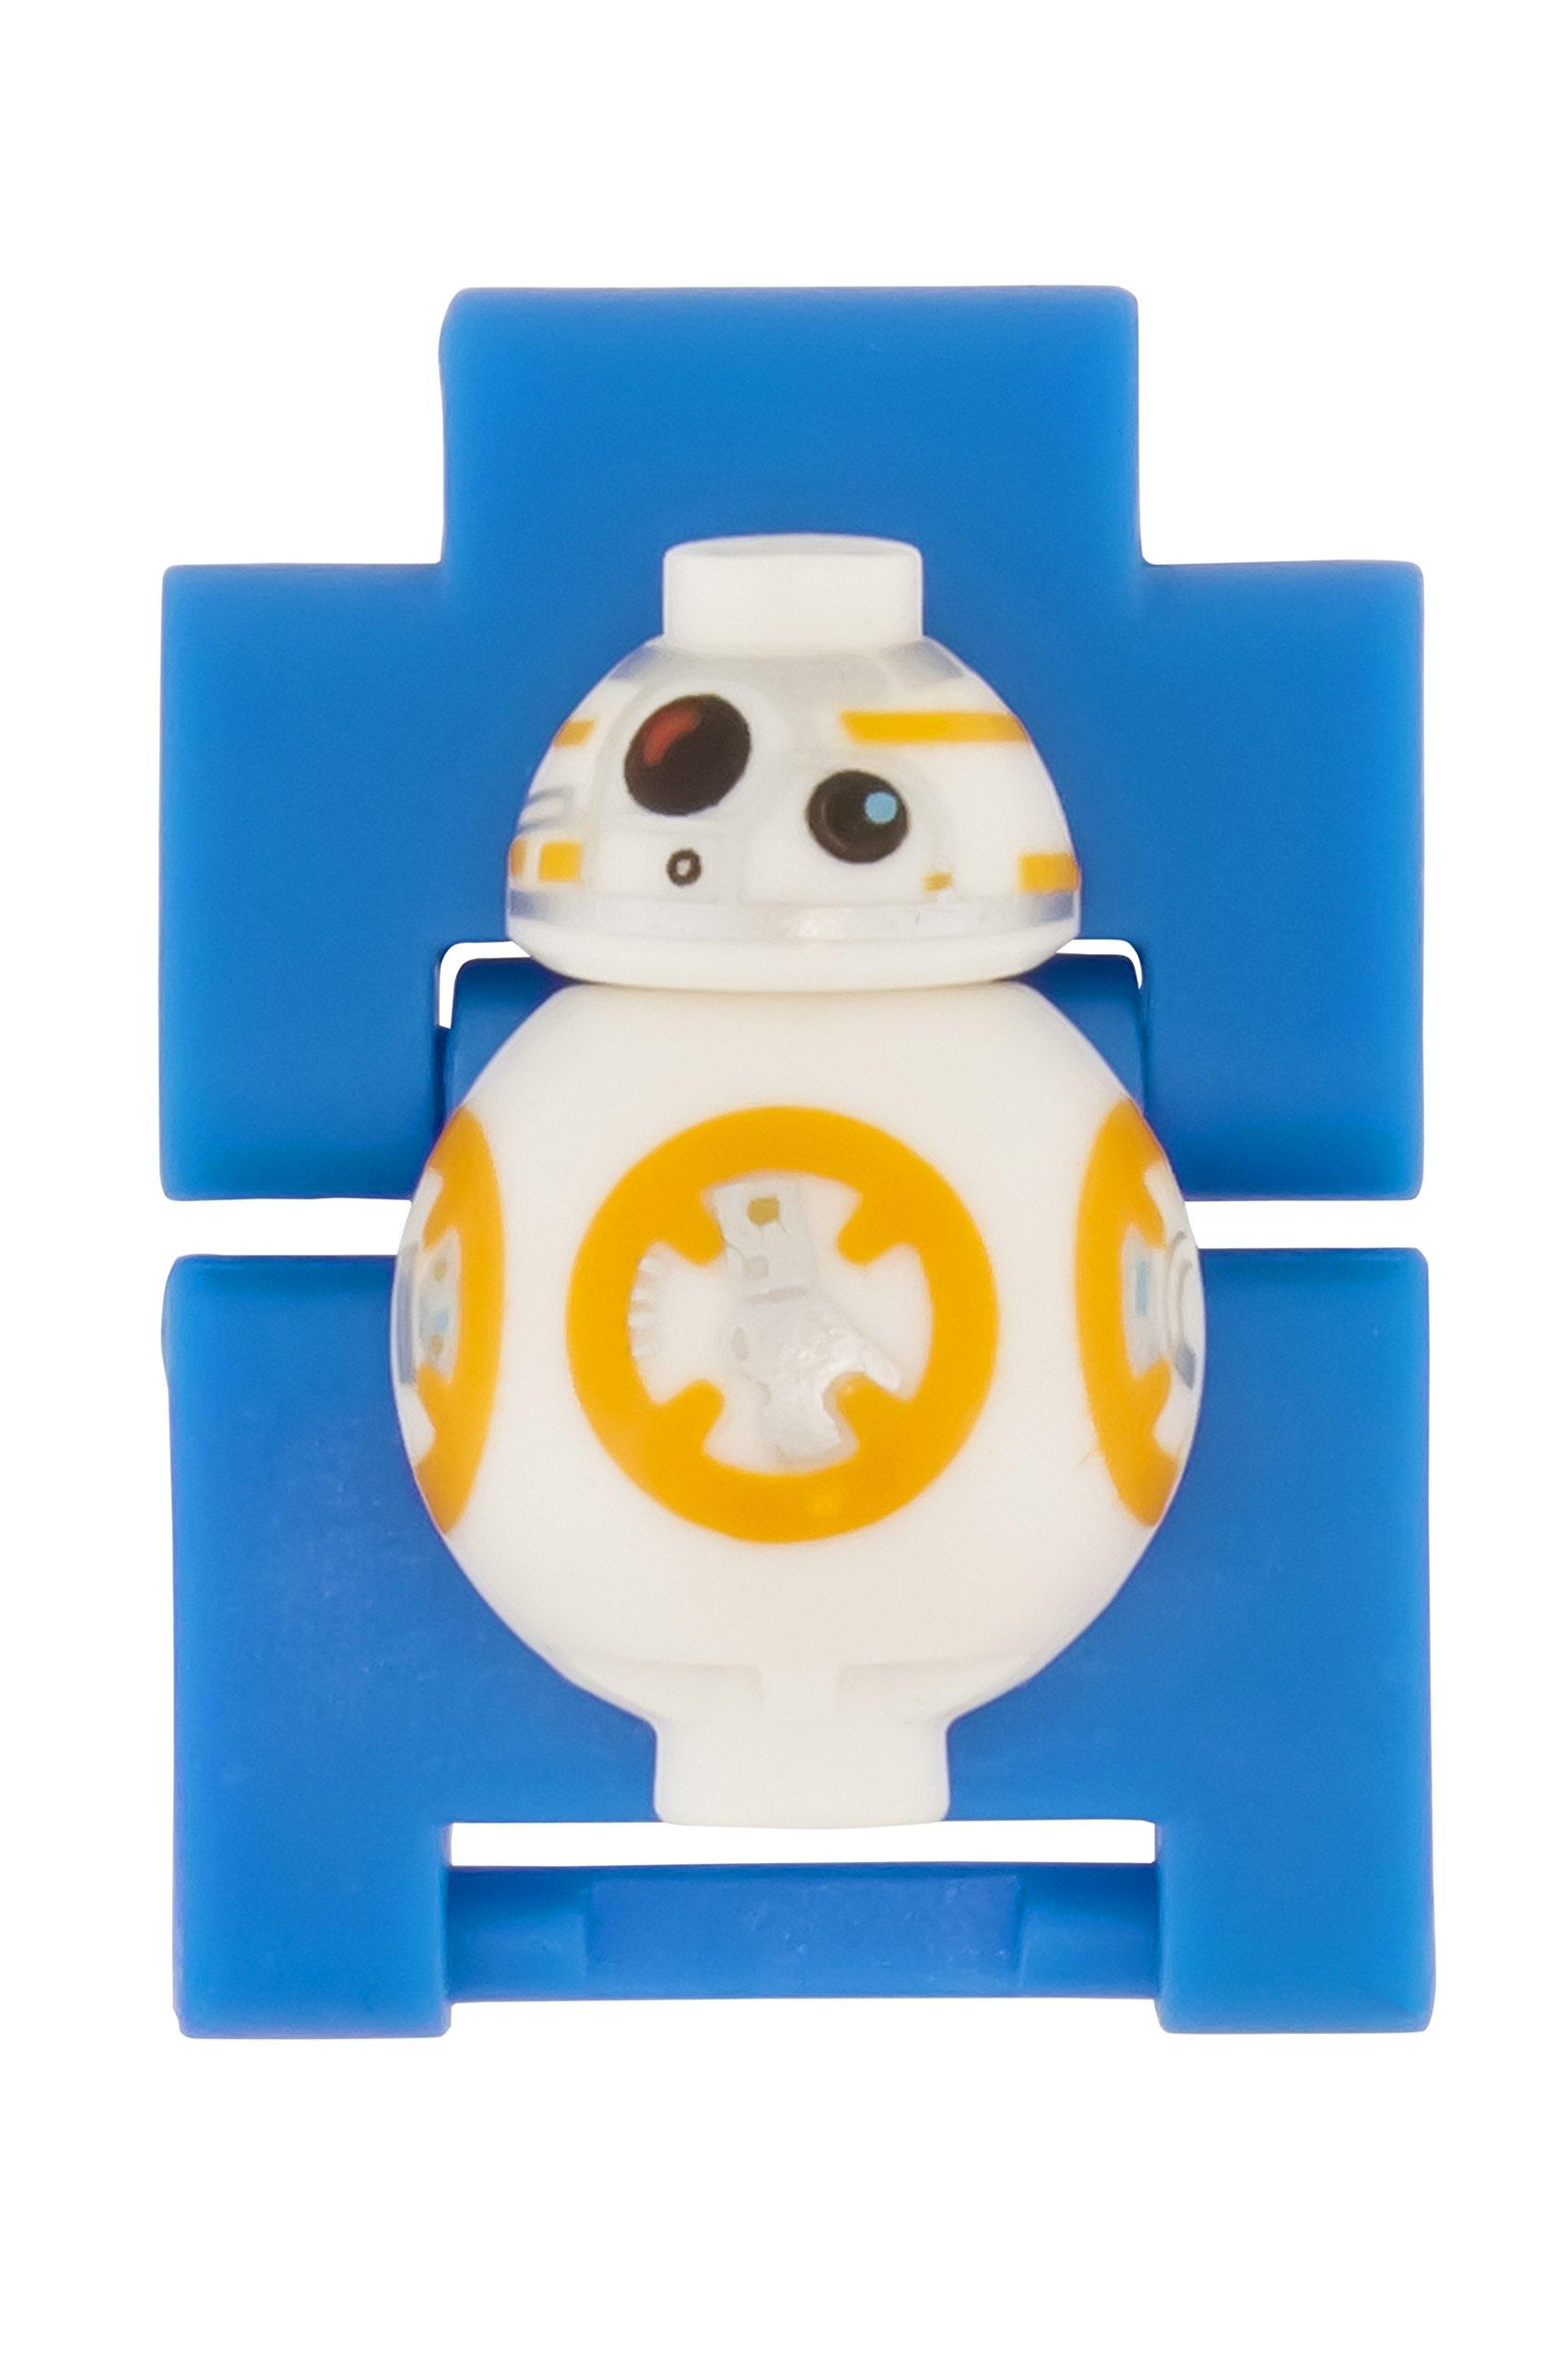 46184fbd3e46 Inicio   Estilos   Chico   Reloj modificable infantil con figurita de BB-8  de LEGO Star Wars 8020929